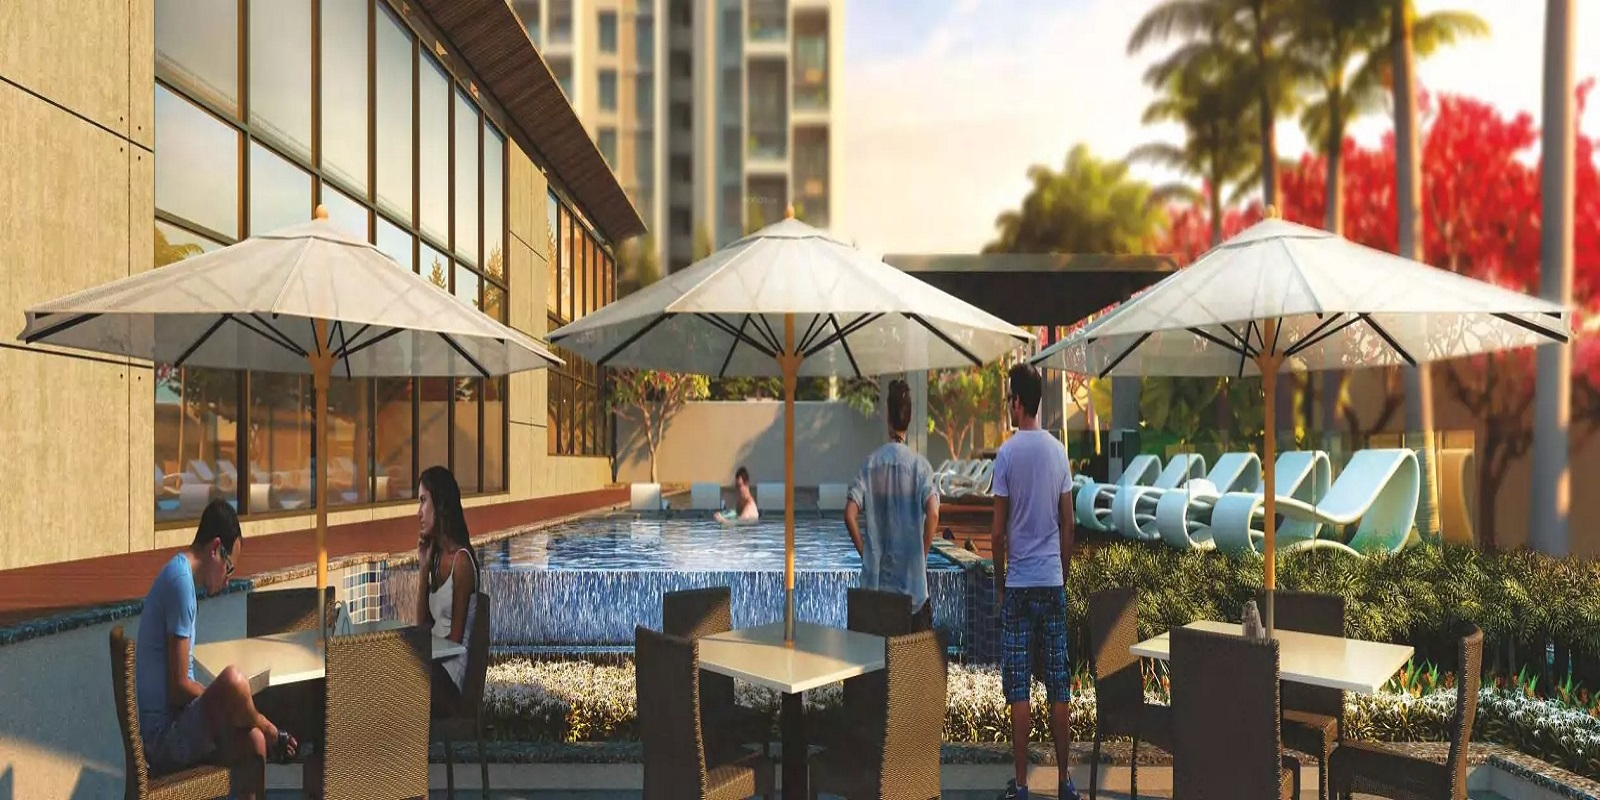 bhandari 32 pinewood drive amenities features7